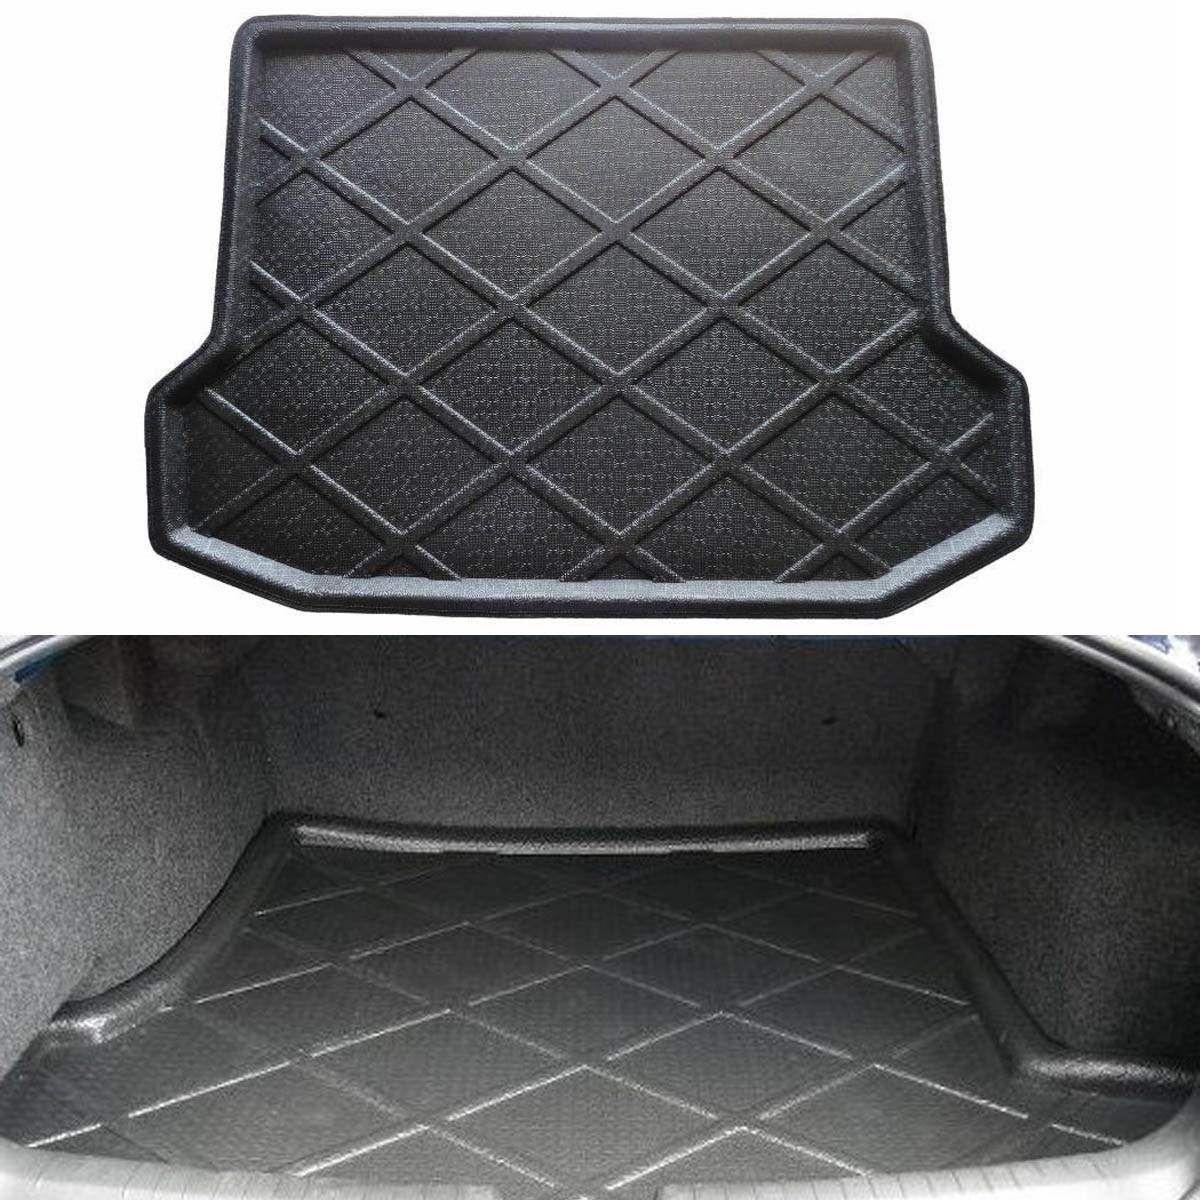 Car Rear Trunk Cargo Floor Protection Mat Pad Liner For Toyota RAV4 2007-2013